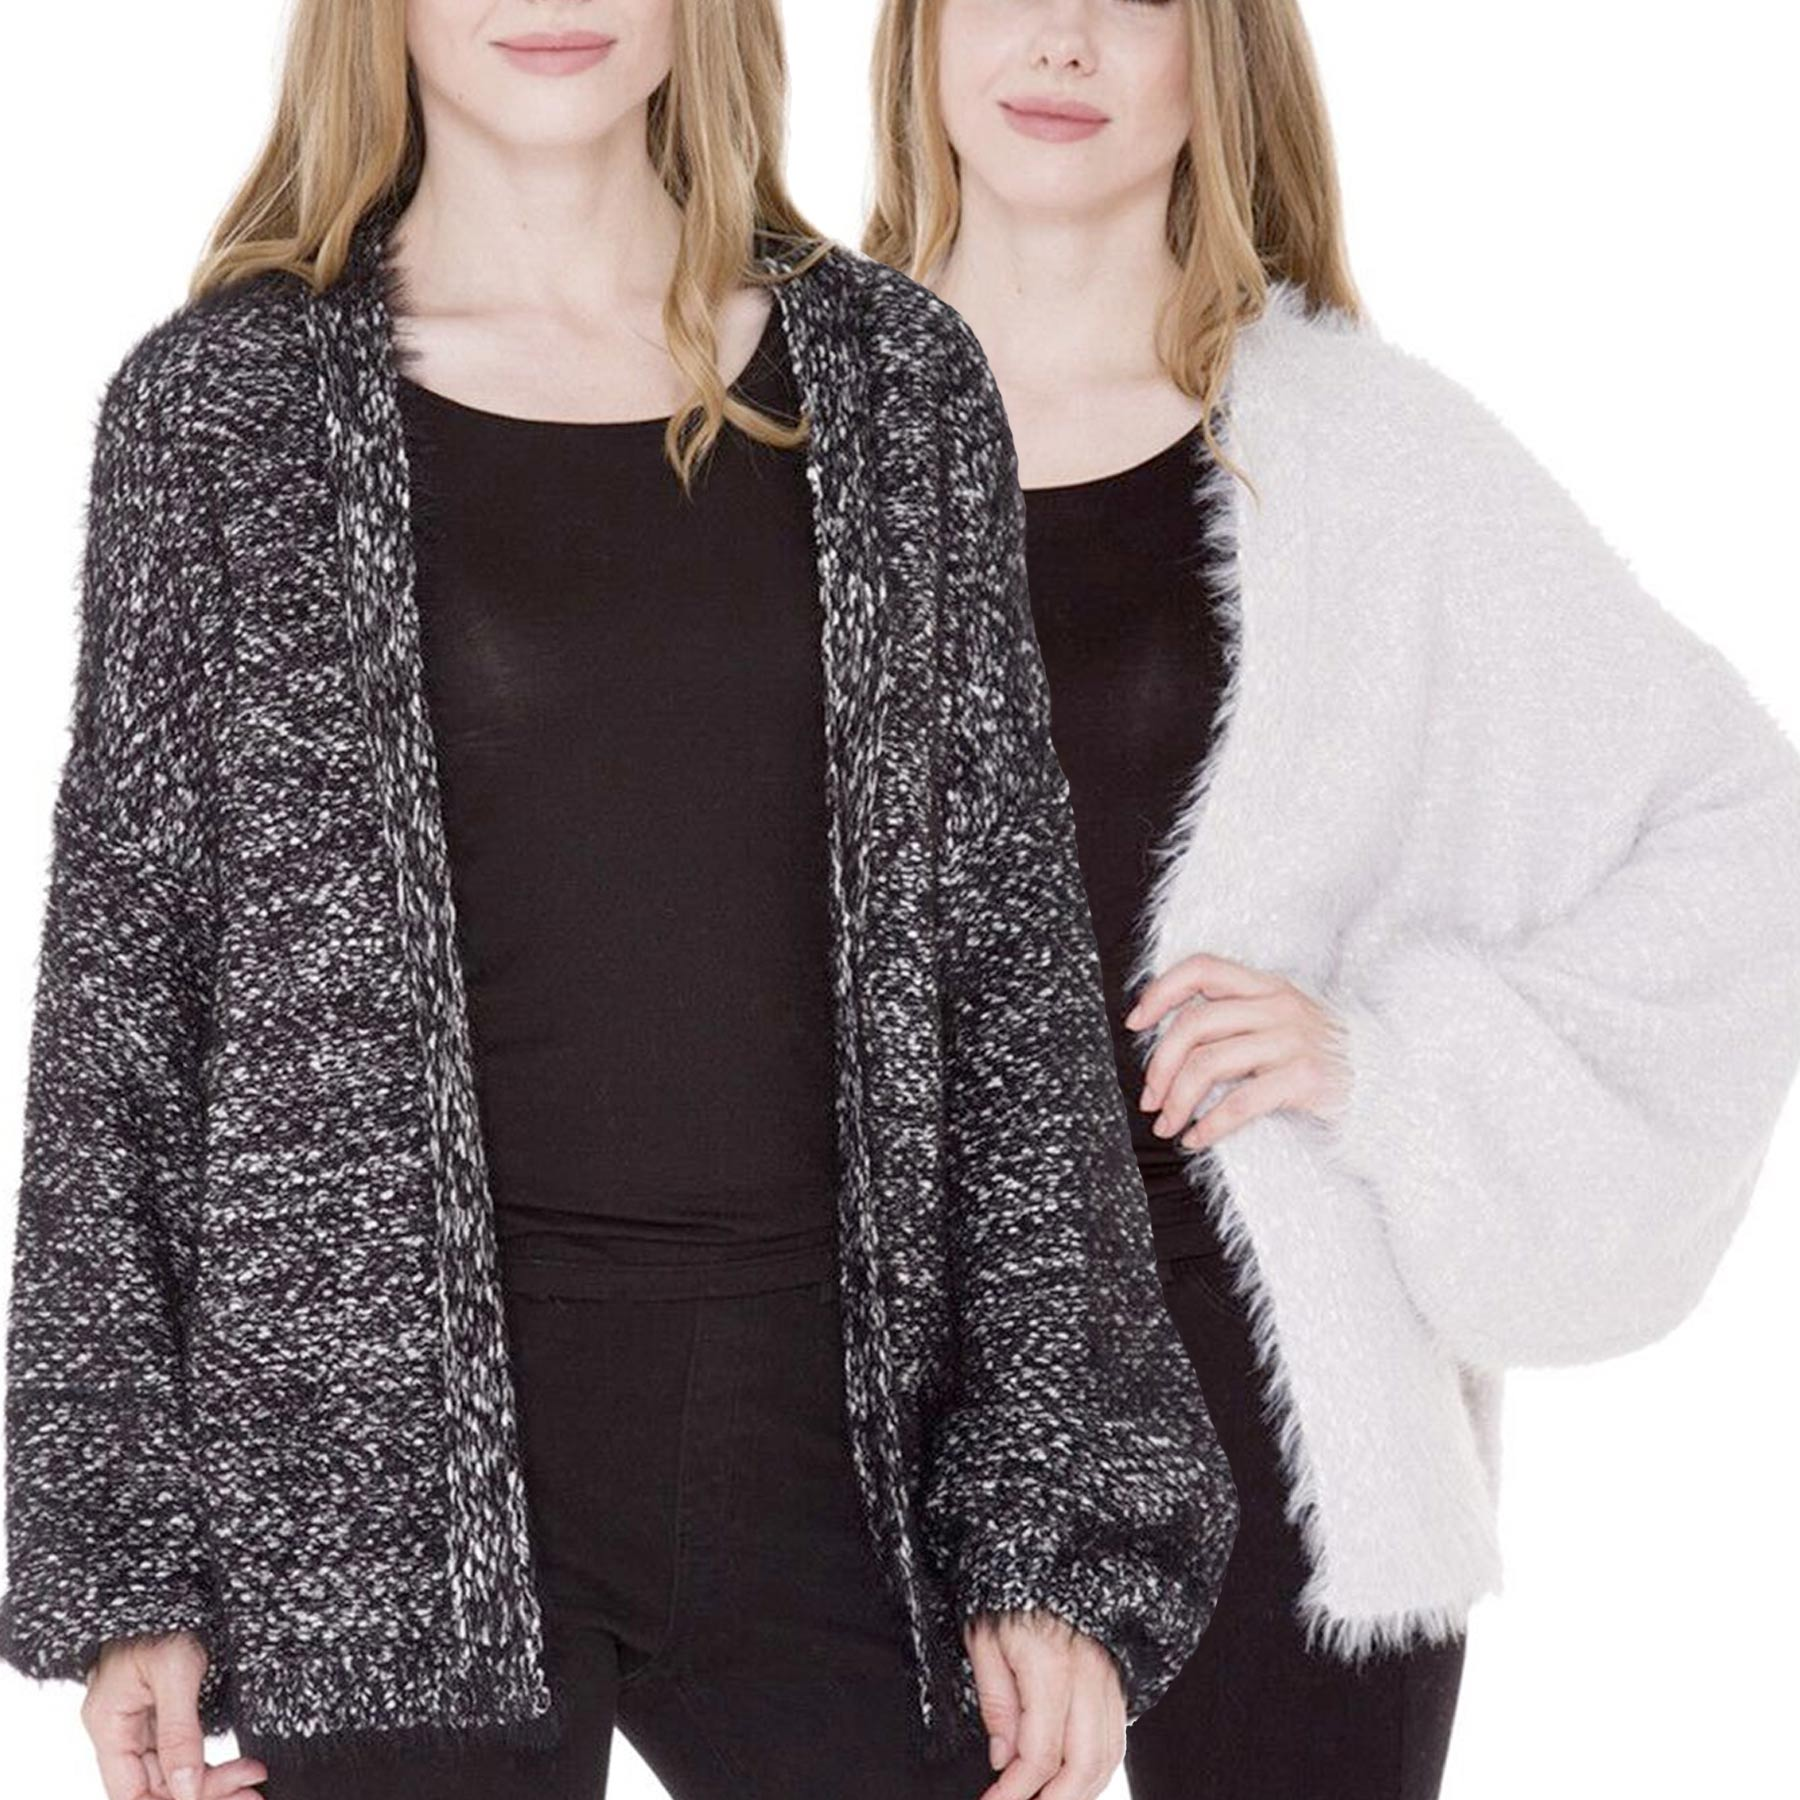 Sweater Cardigan - Furry Eyelash Design JP969